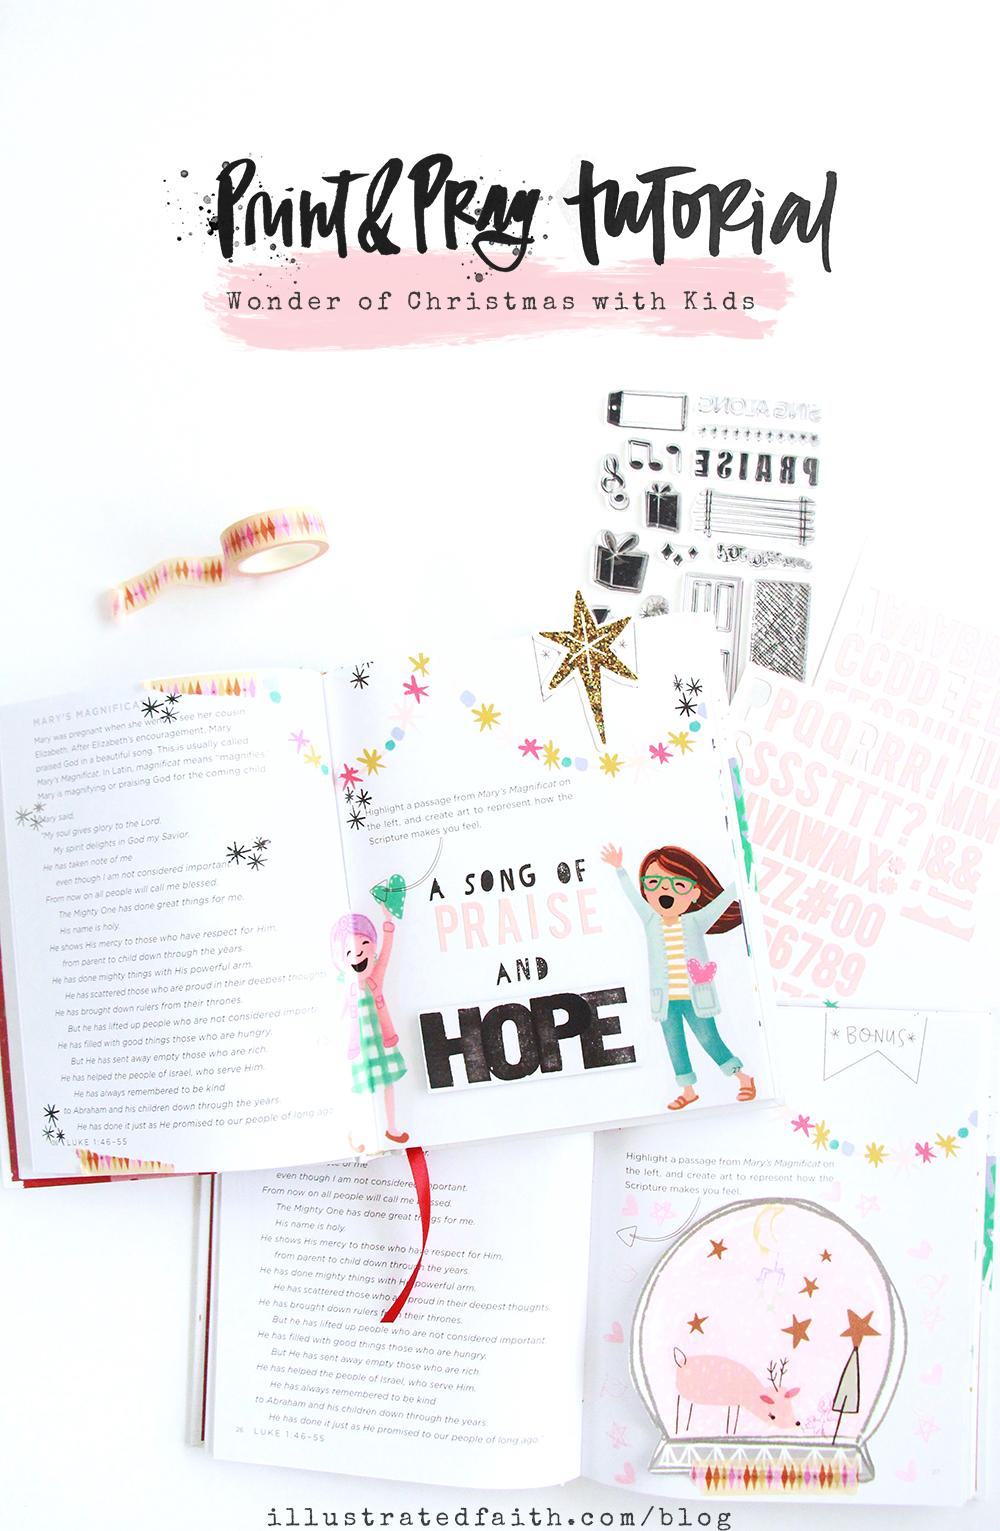 The Wonder of Christmas | Day 4 | Bible Journaling With Kids by Bekah Lynn aka SimplyBekah